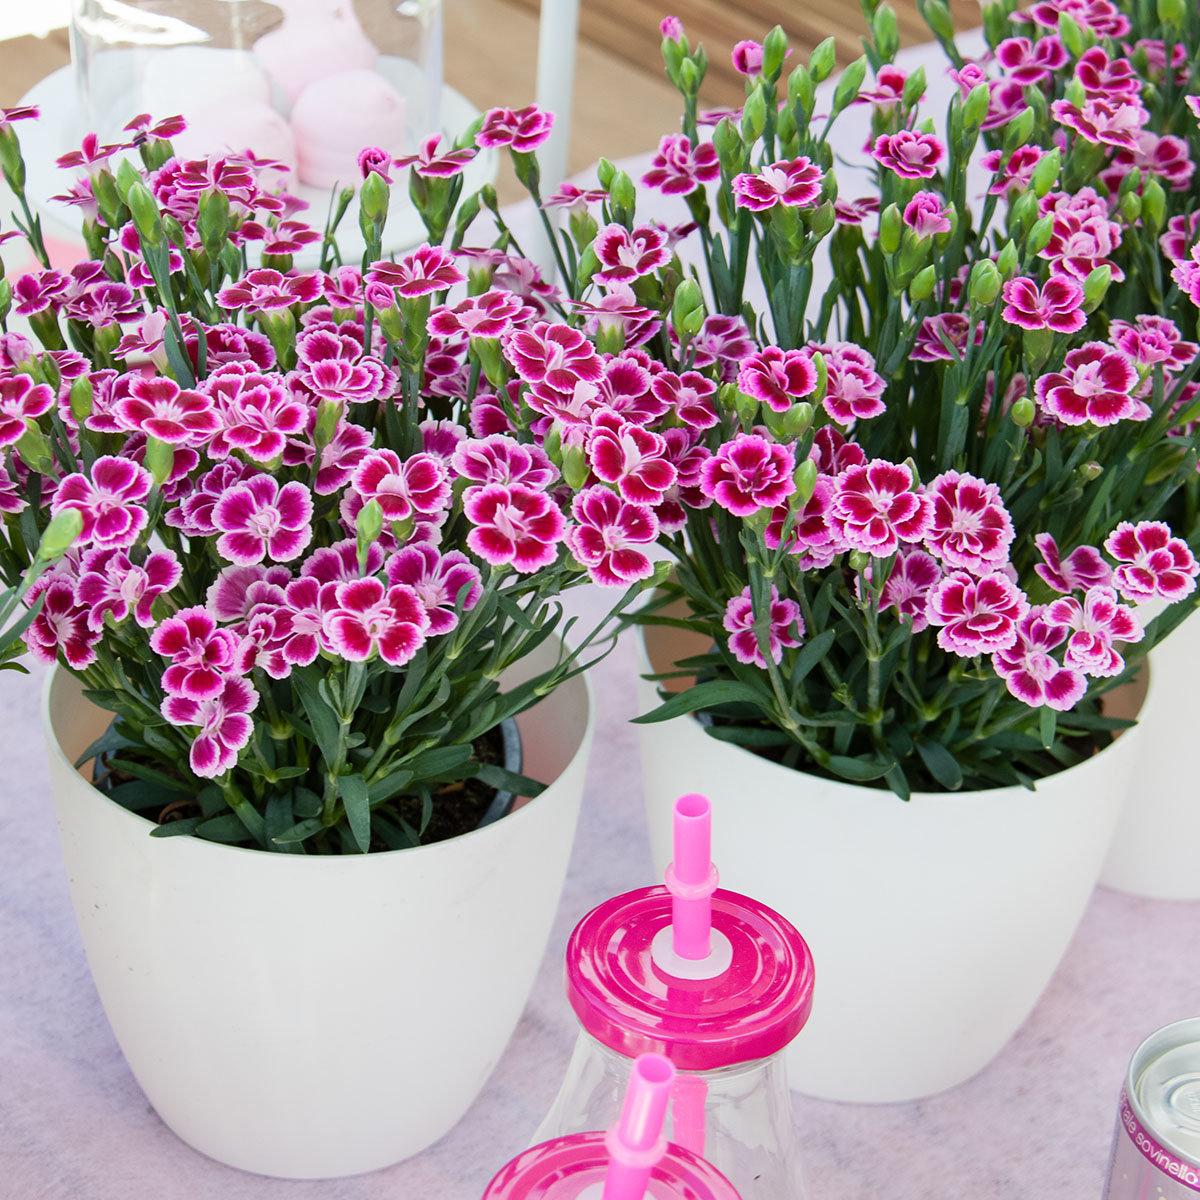 prinzess nelke pink kisses online kaufen bei g rtner p tschke. Black Bedroom Furniture Sets. Home Design Ideas